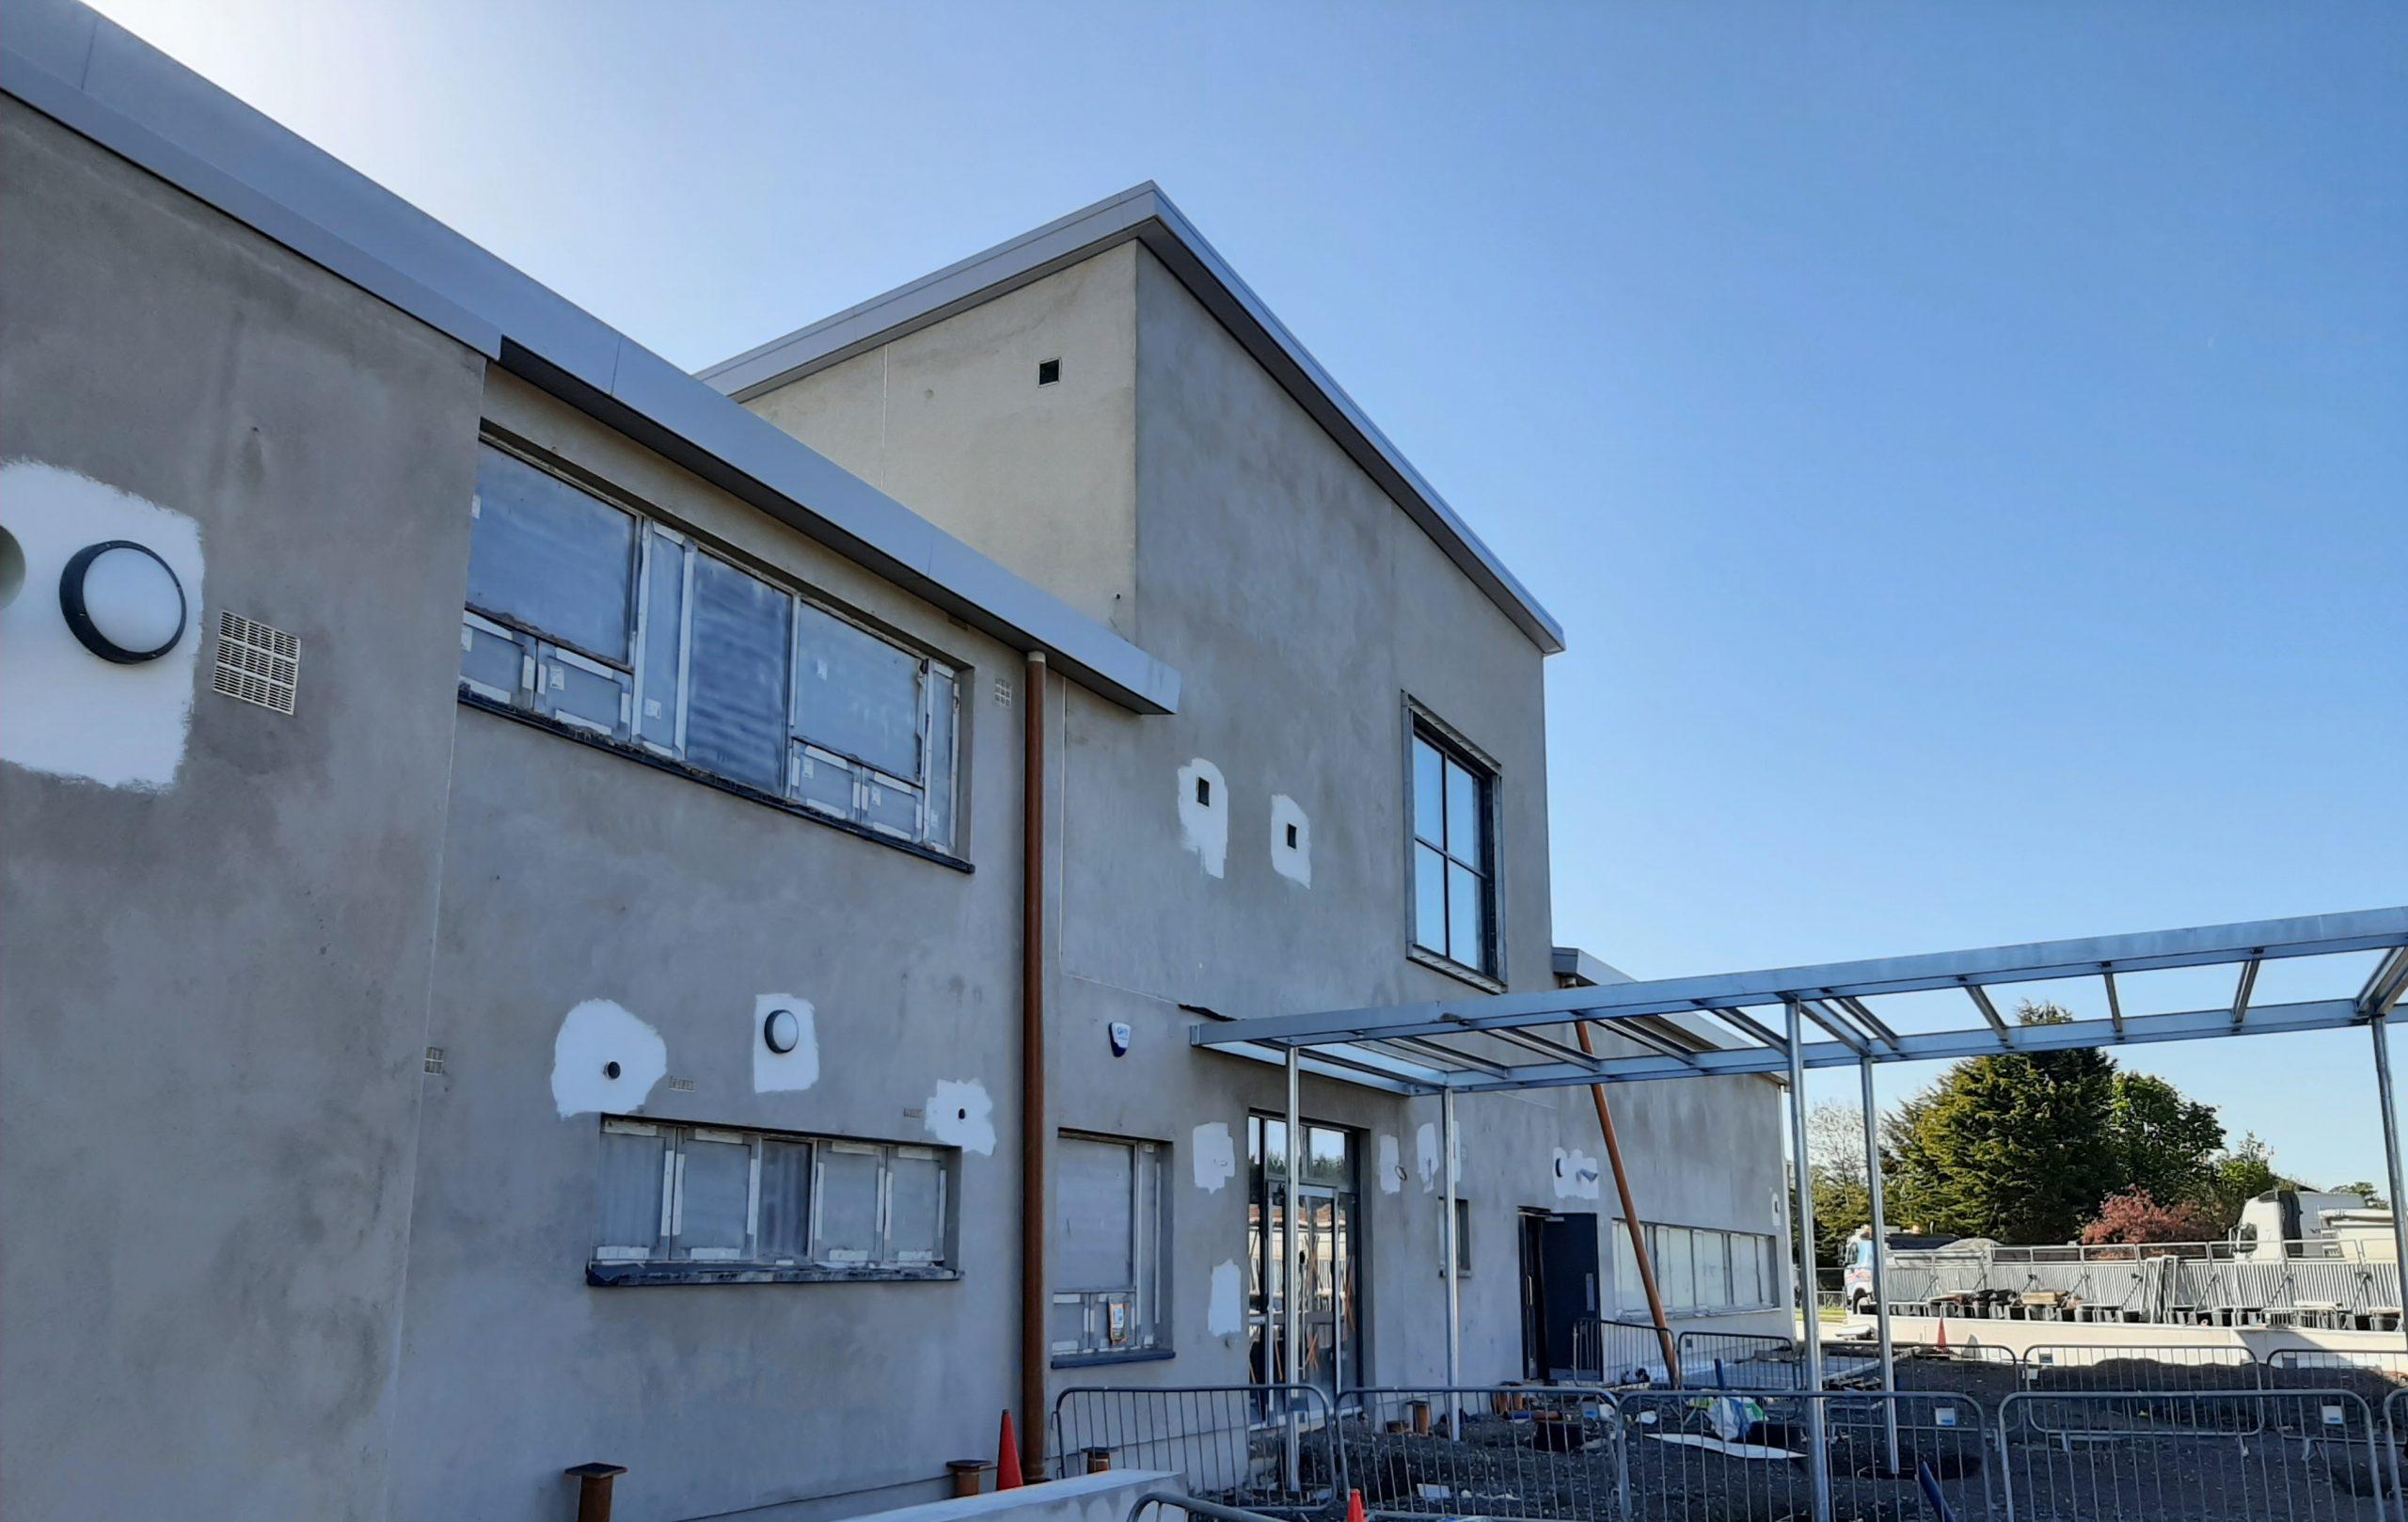 Whitecross National School, Julianstown, Co. Louth